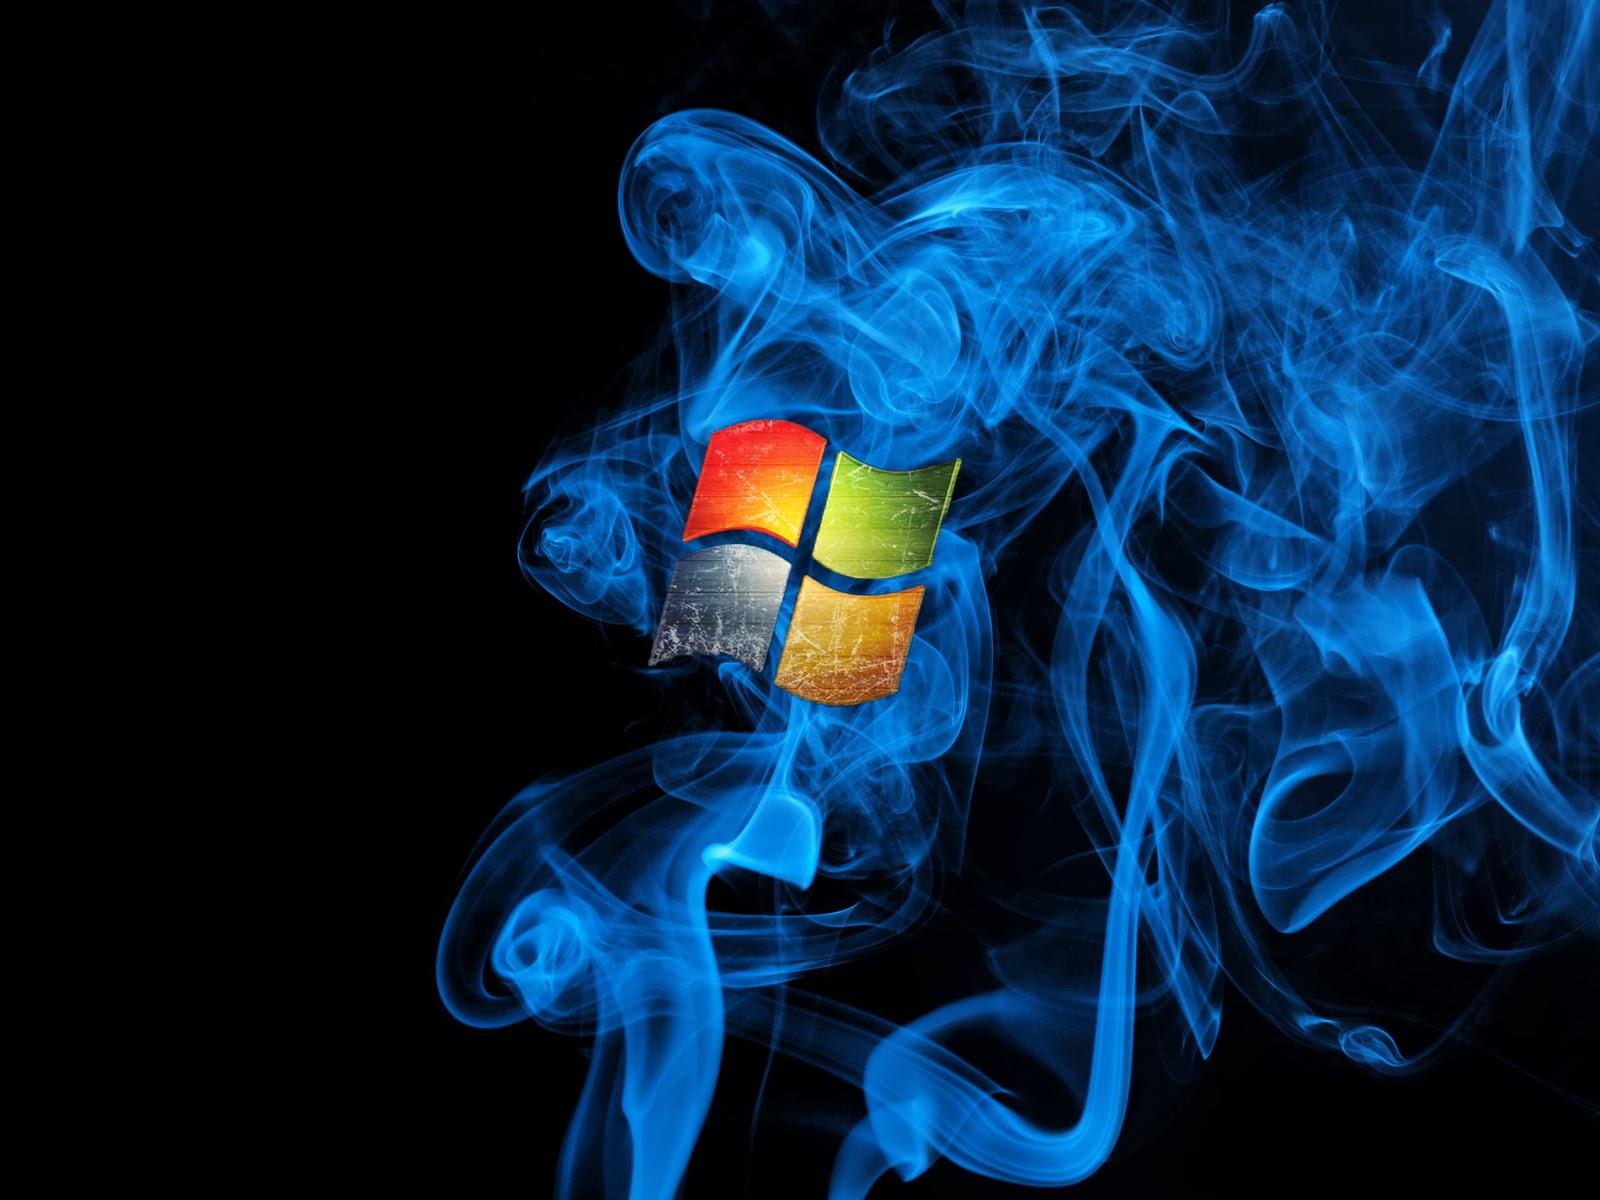 Blue flame live wallpaper   beautiful desktop wallpapers 2014 1600x1200